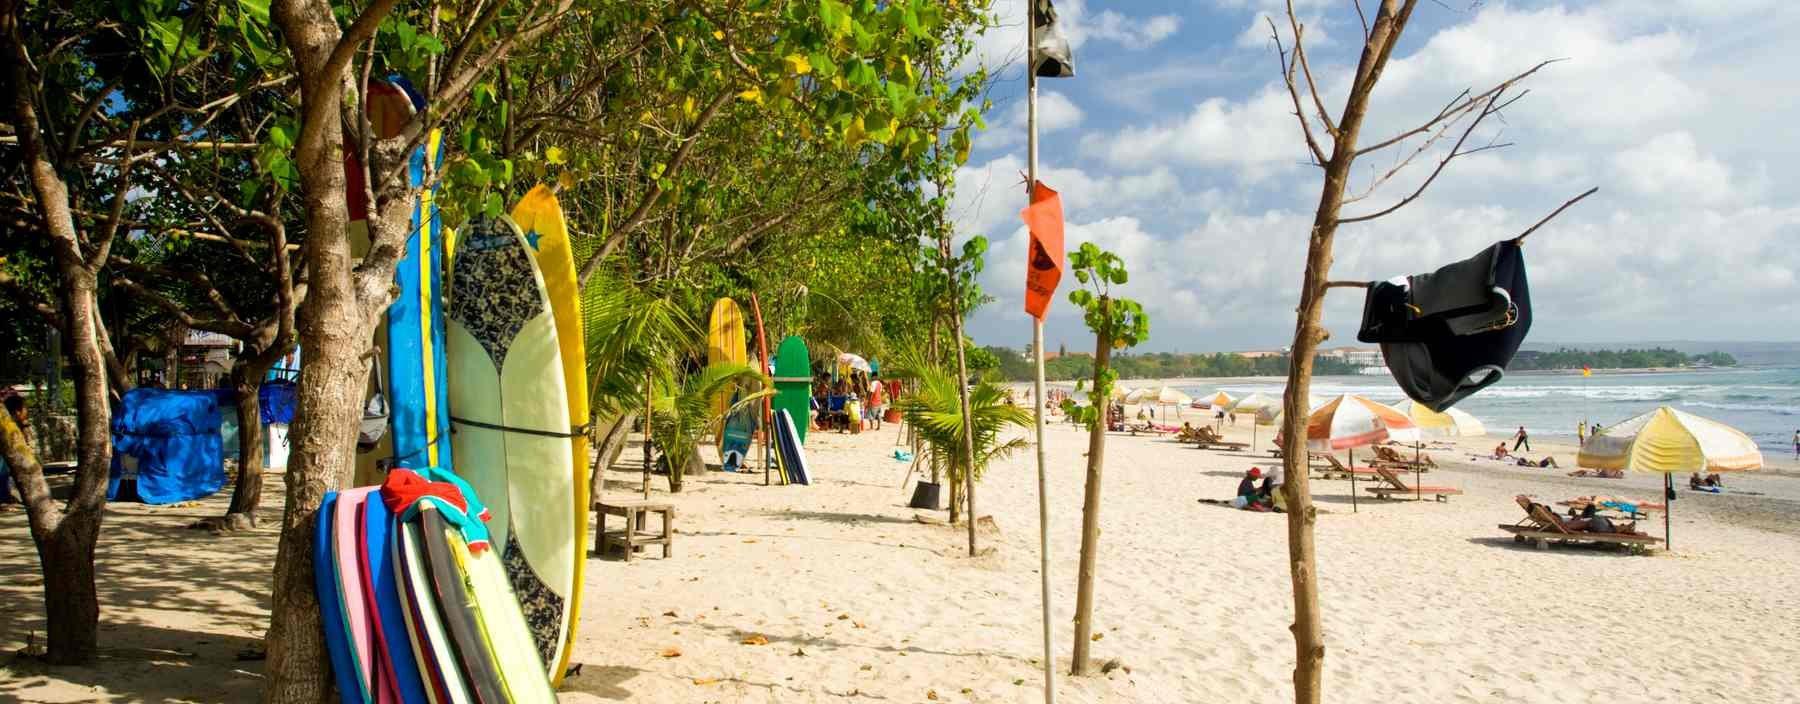 id, bali, kuta beach (4).jpg